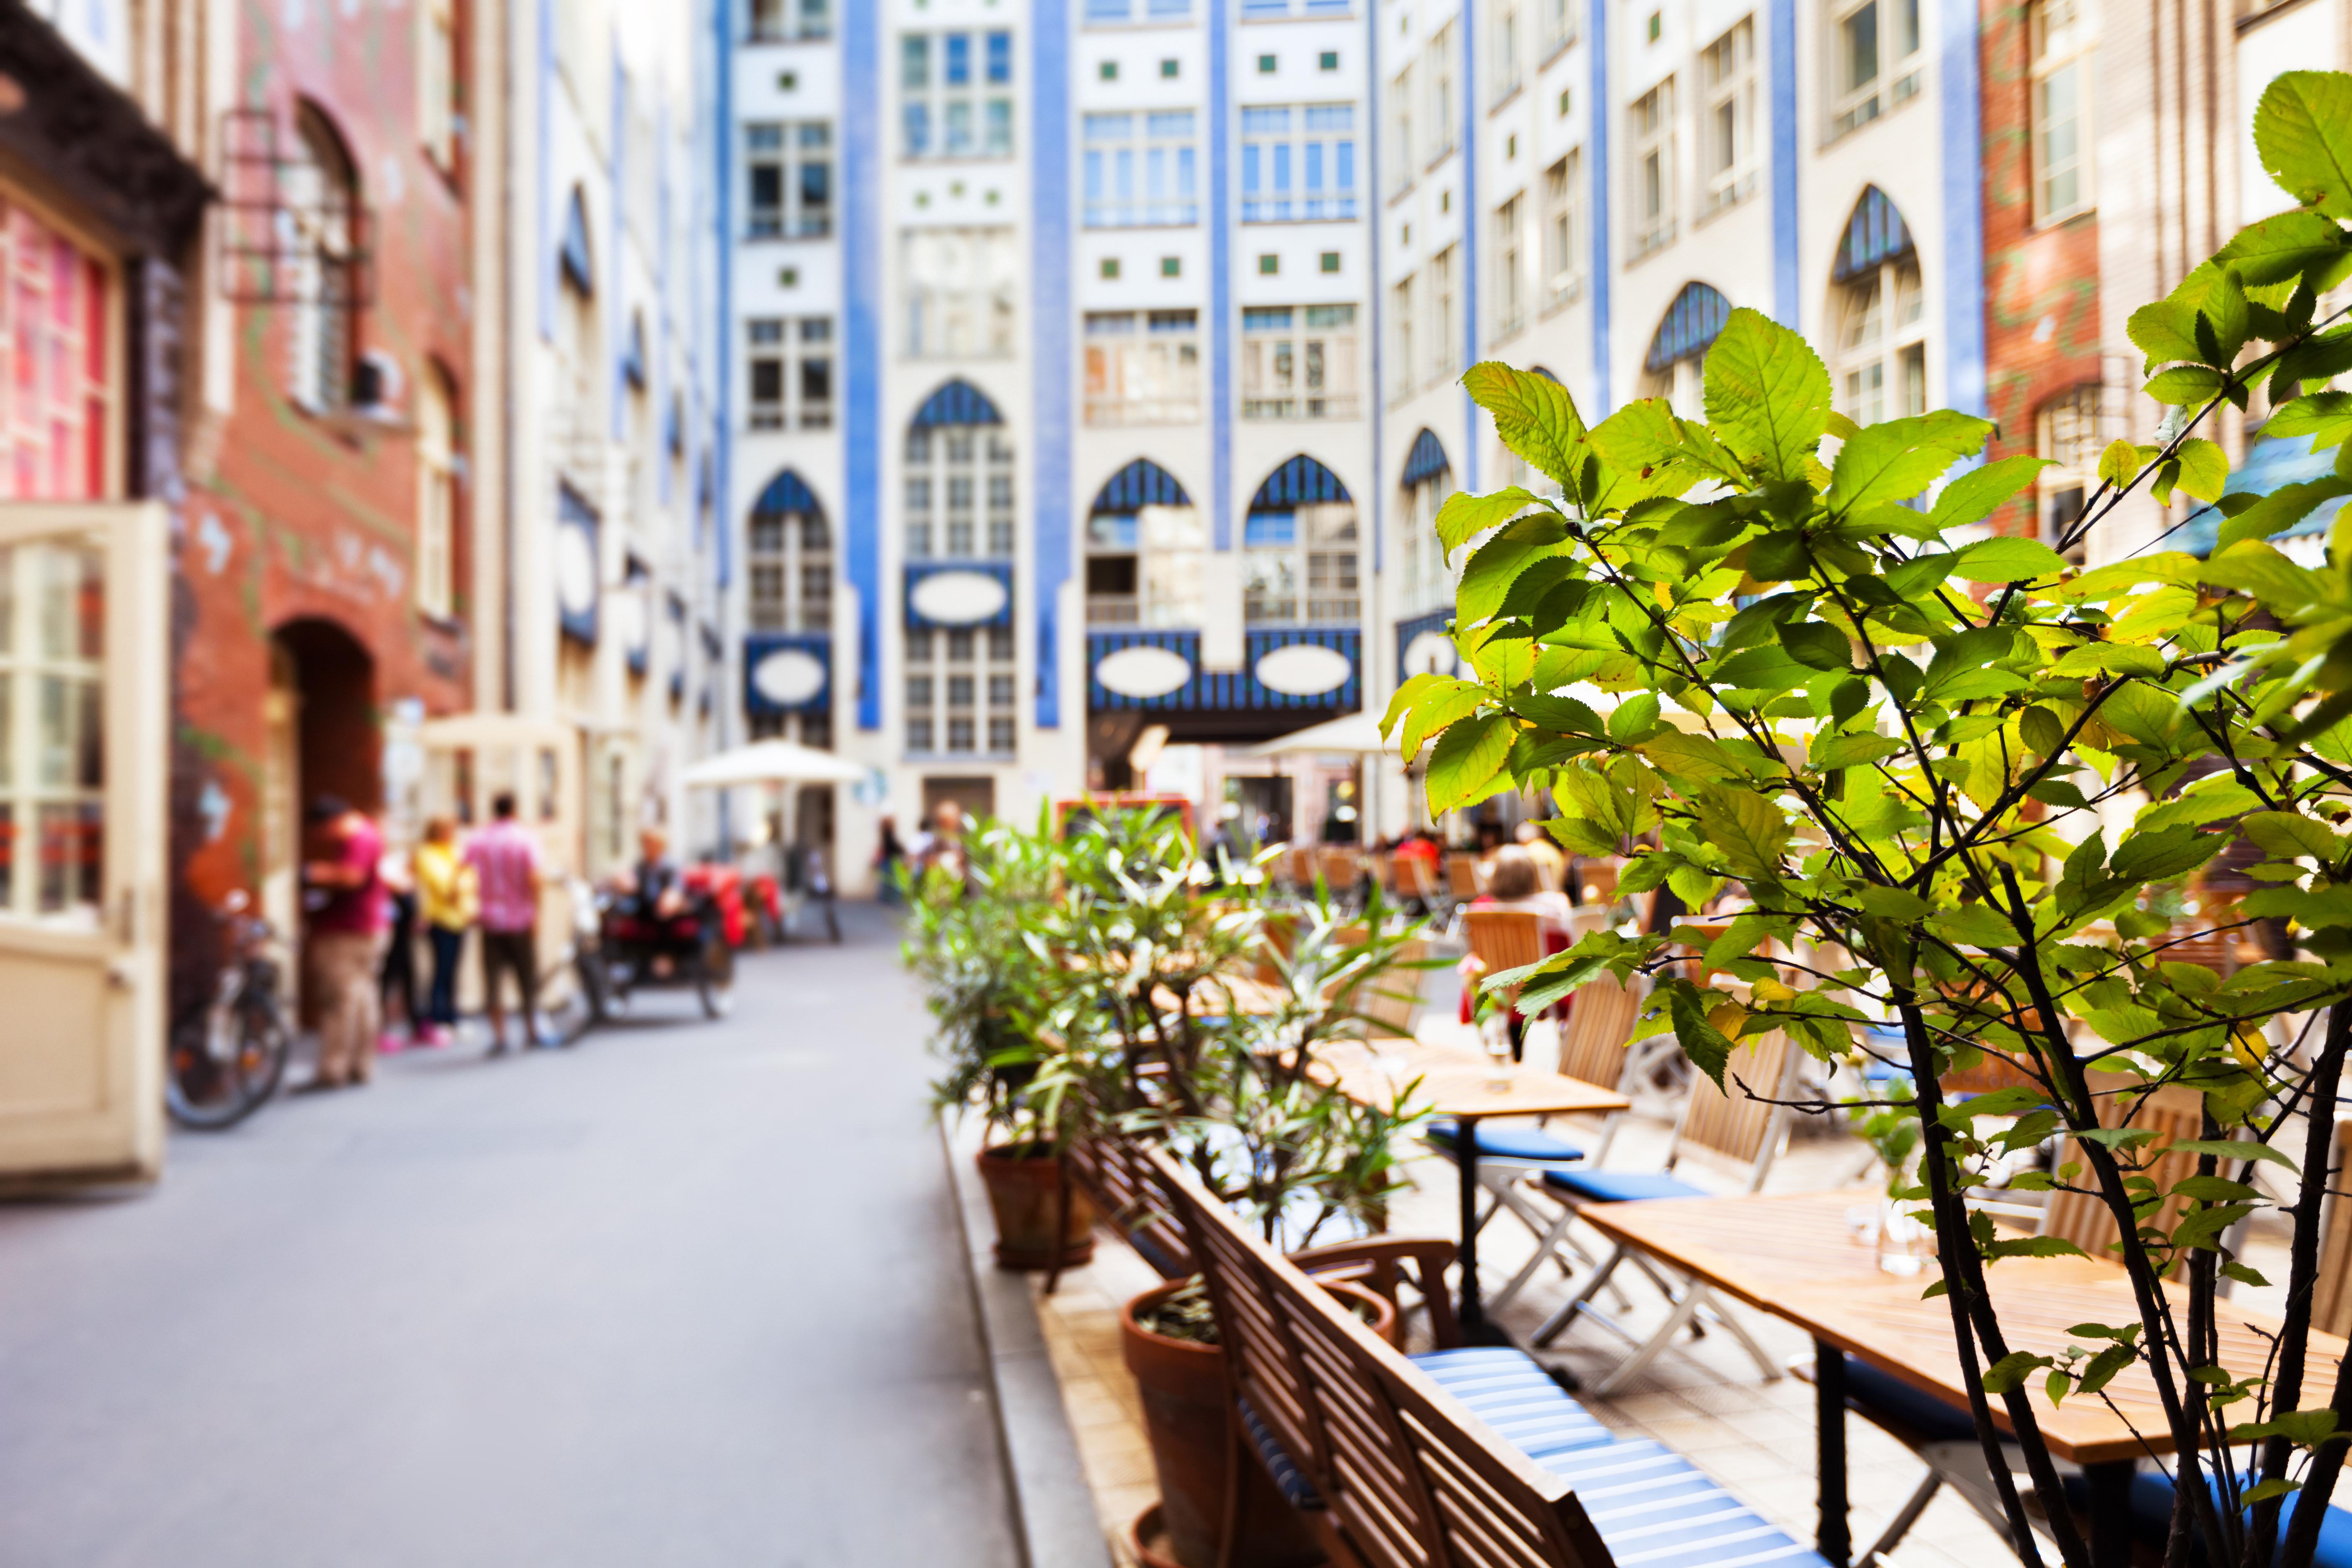 Summer Program - German | CIEE High School Summer Abroad: German Language & Culture in Berlin